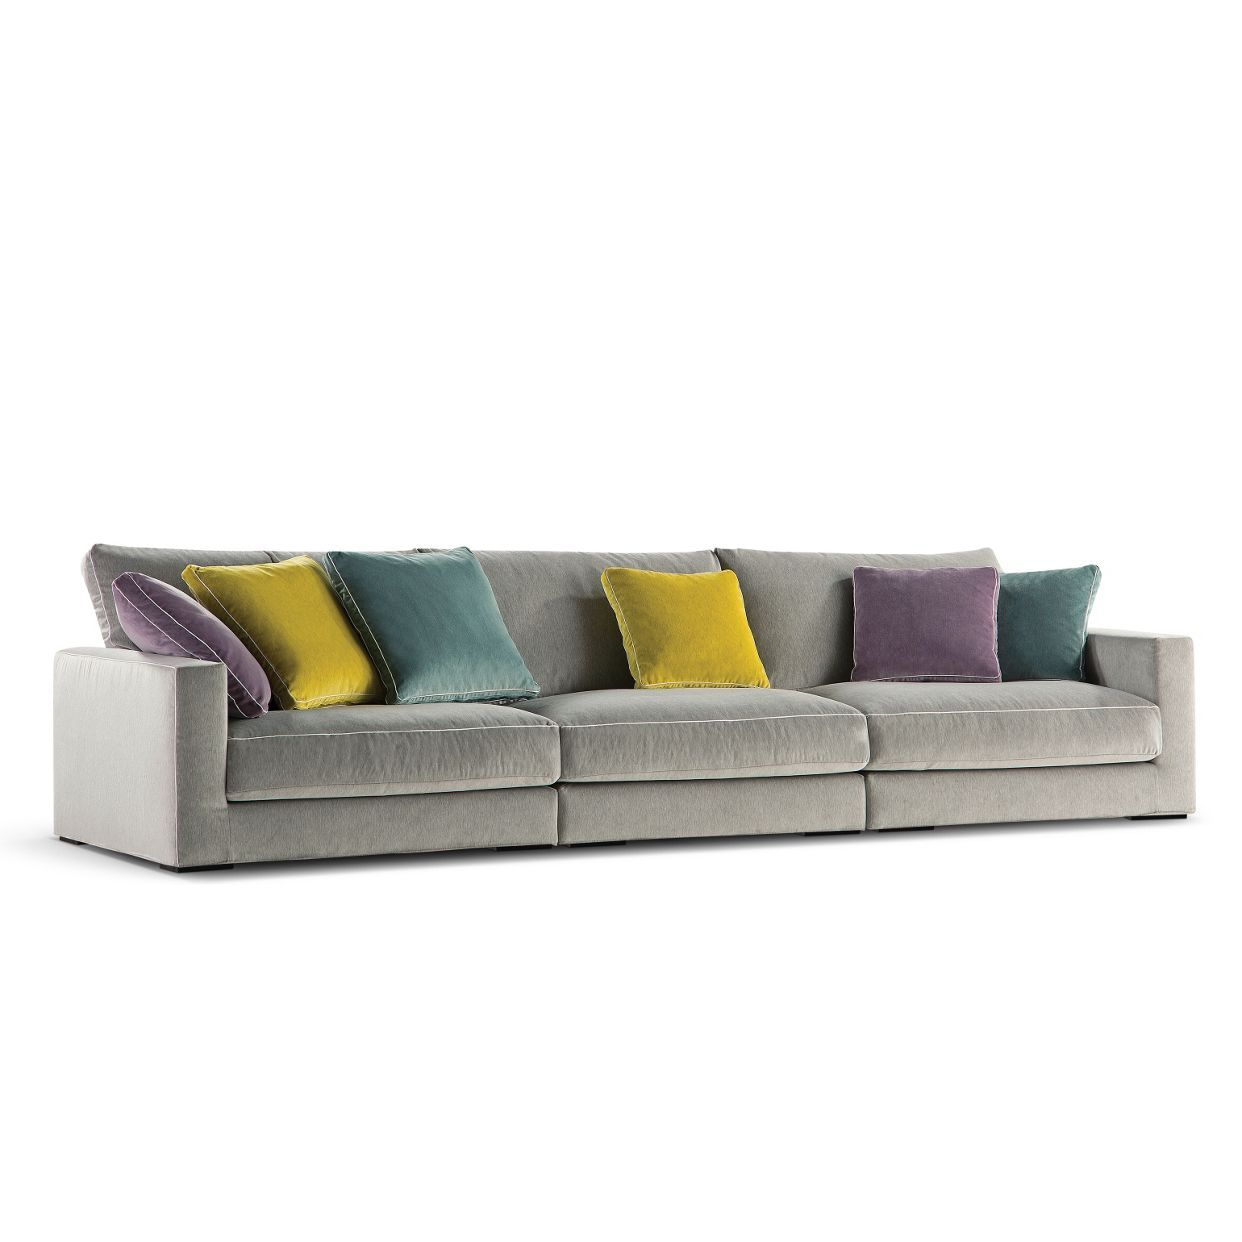 Long Island 2 Straight Composition Roche Bobois Modern Sofa Designs Classy Living Room Sofa